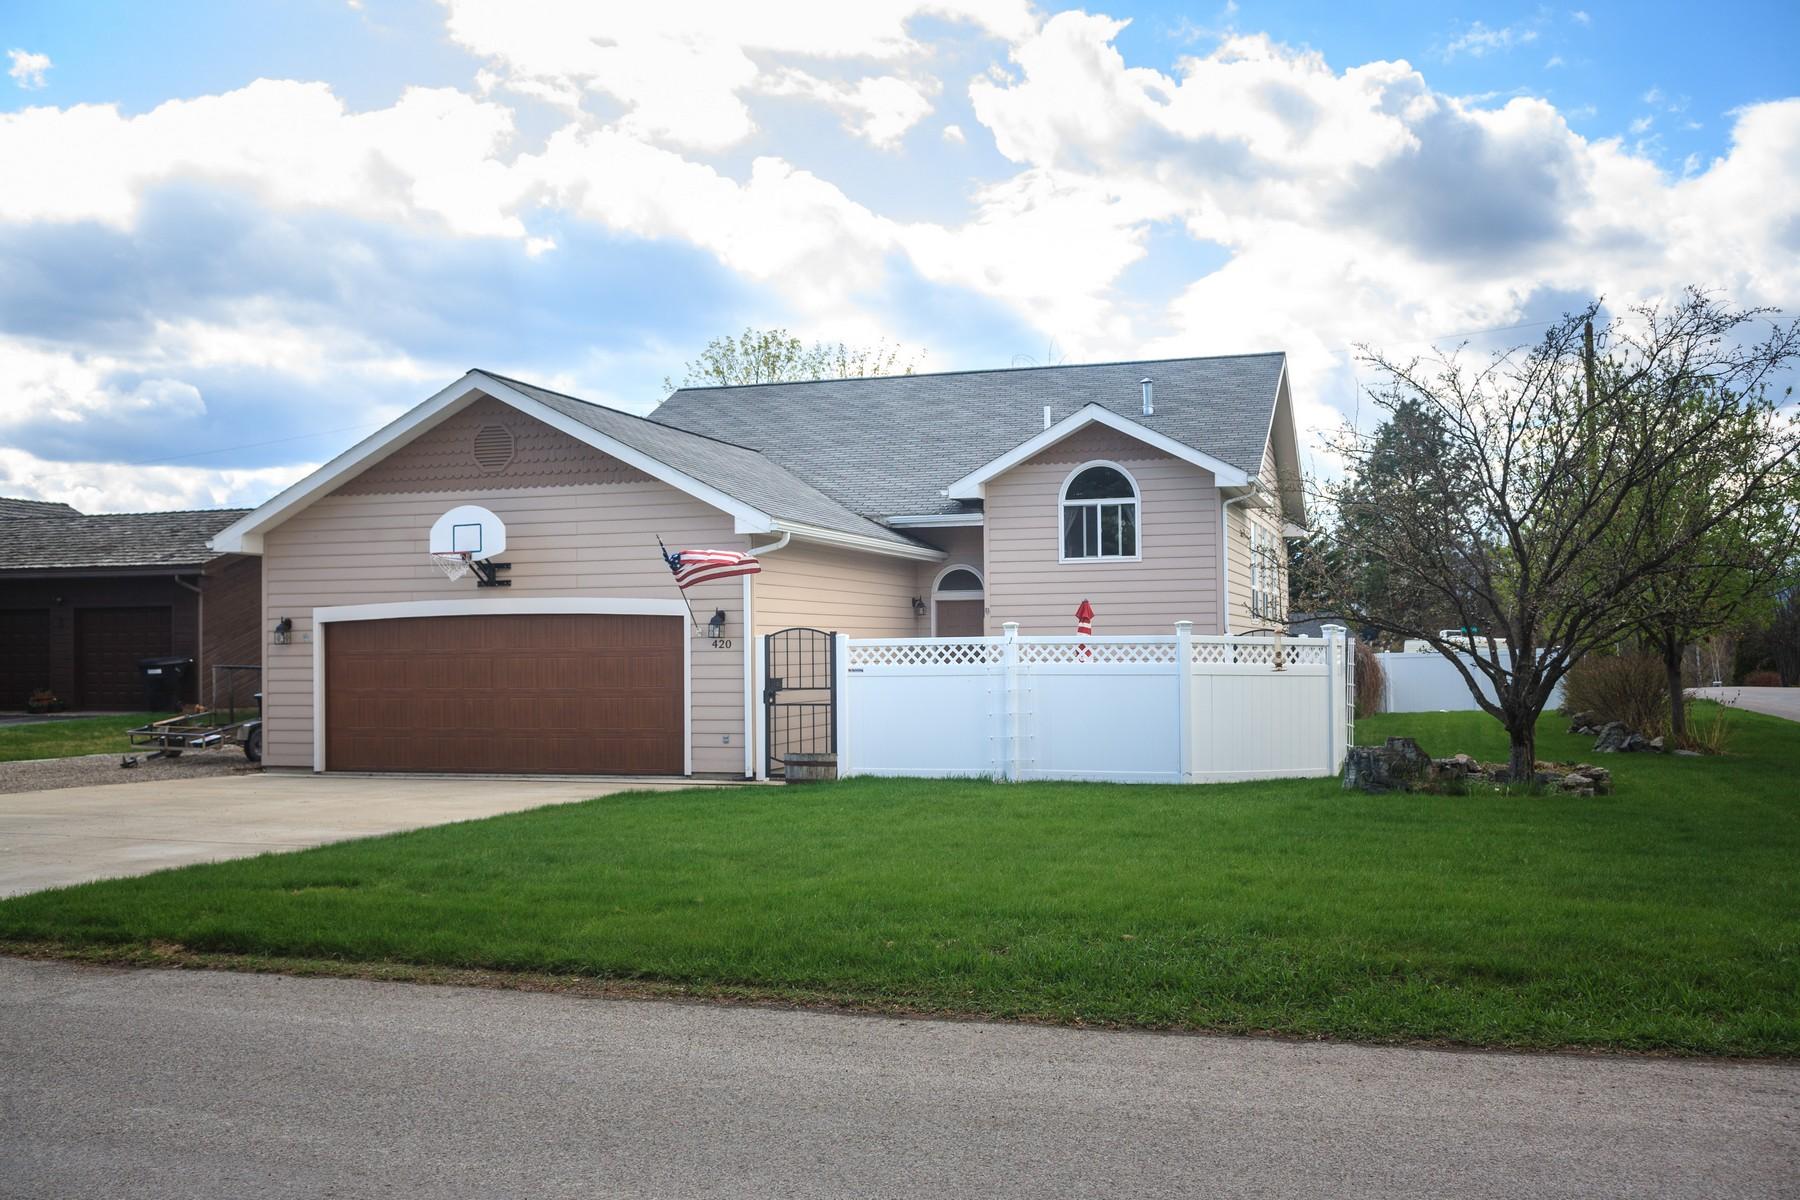 Villa per Vendita alle ore 420 Crestview Drive 420 Crestview Road Kalispell, Montana, 59901 Stati Uniti